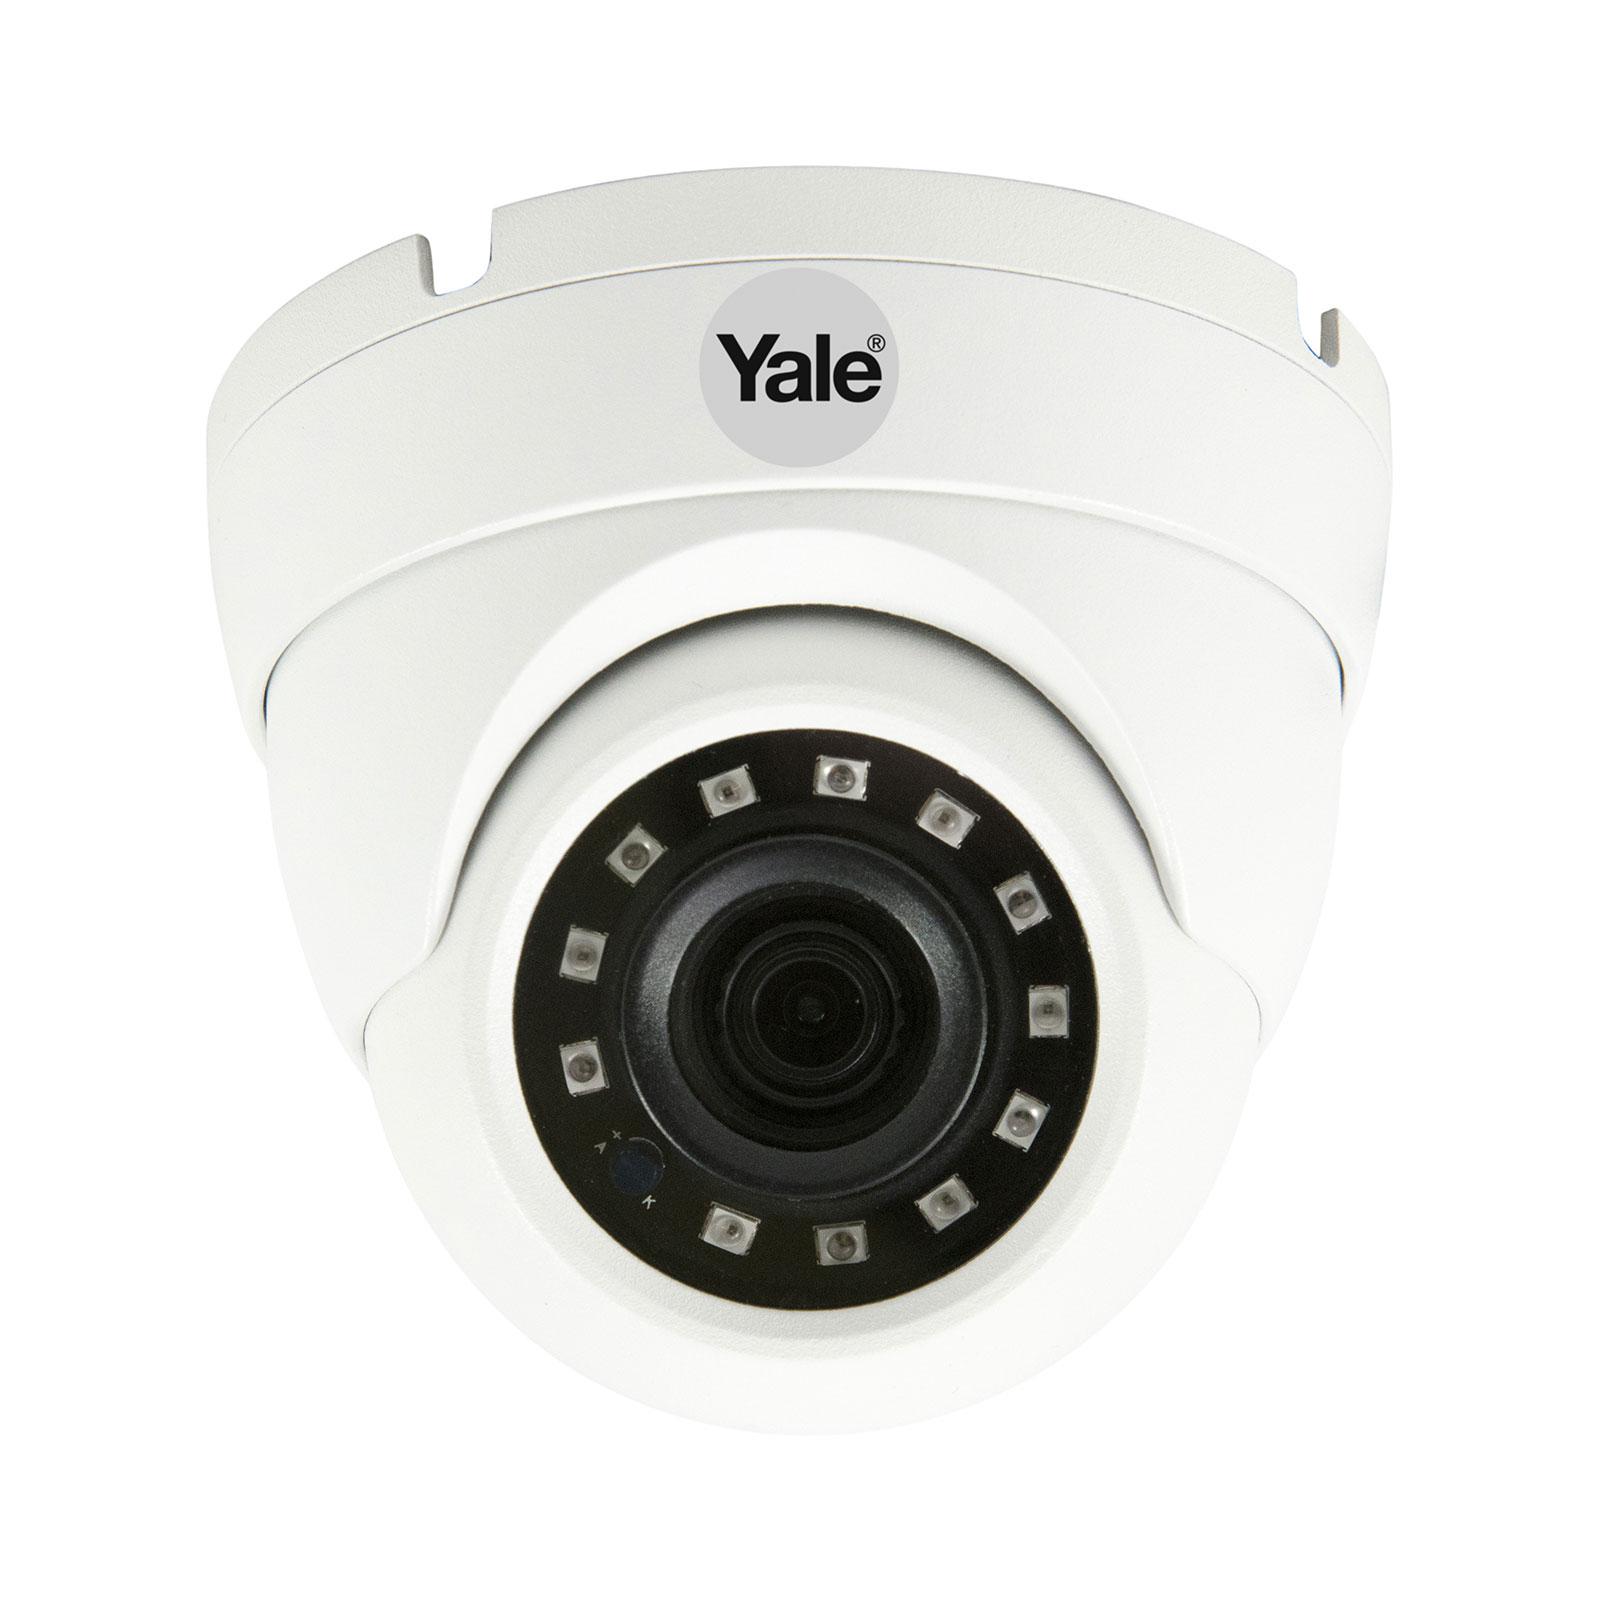 Yale CCTV Fix-Dome Erweiterungs-Kamera